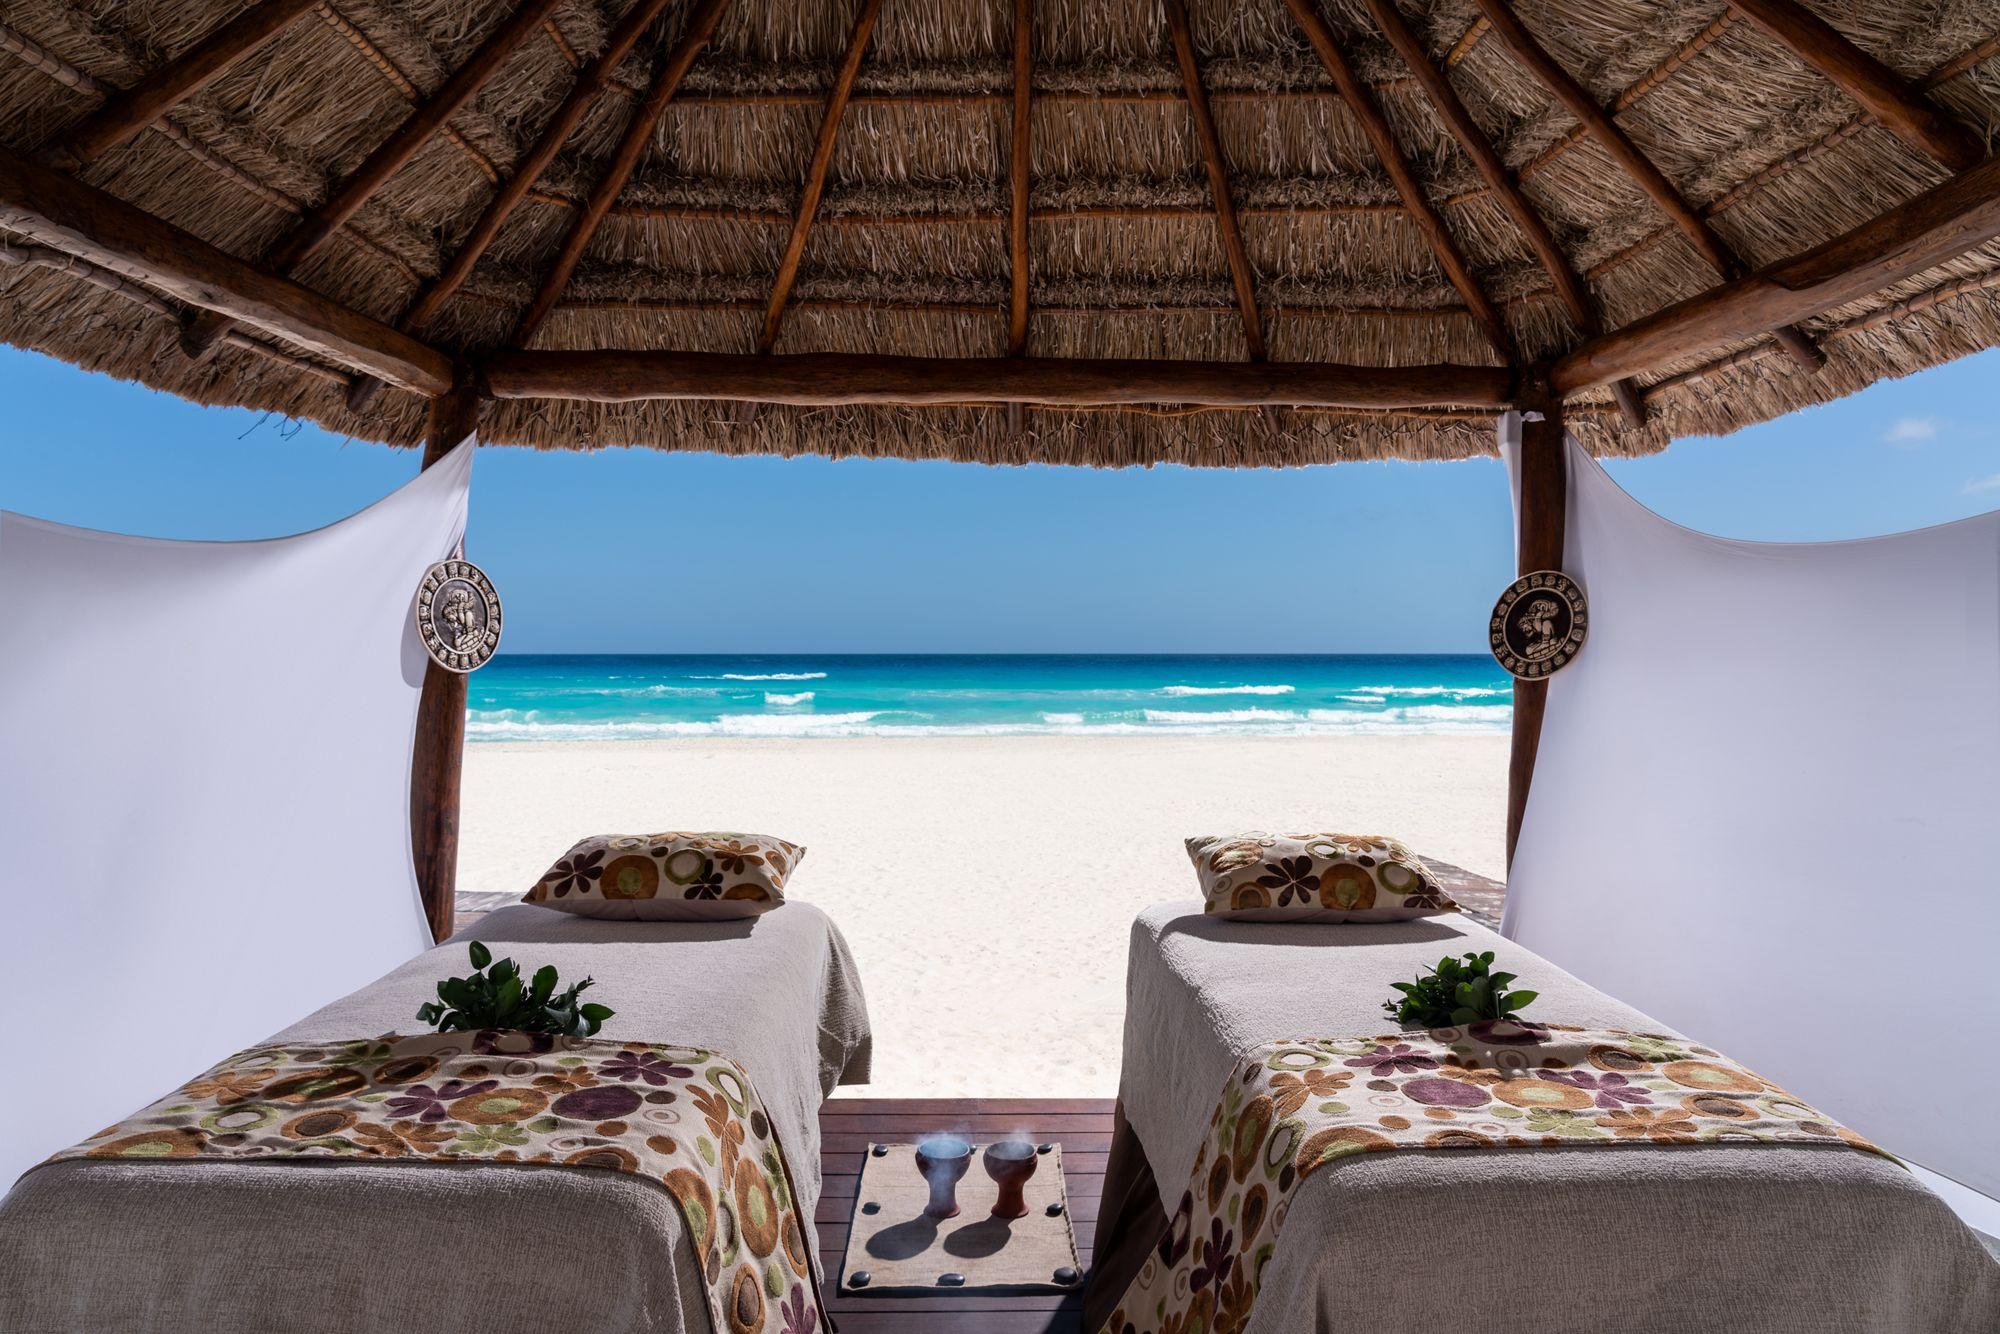 Cancun Luxury Hotel Spa The Ritz Carlton Cancun